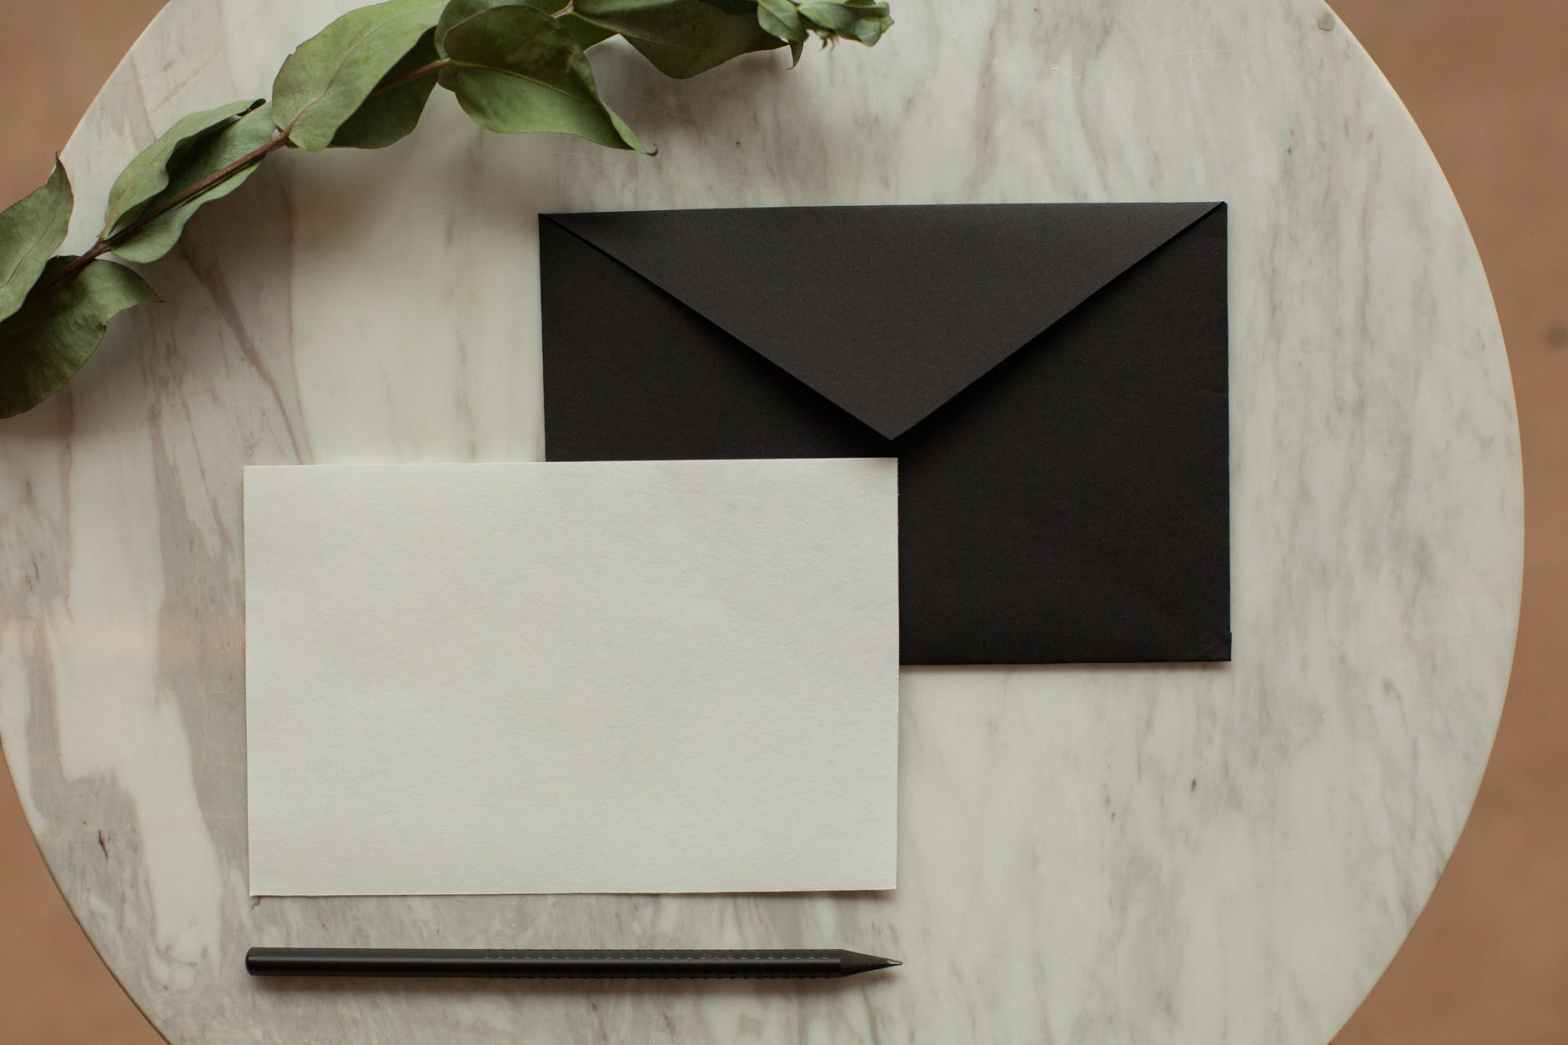 creative mock up envelope near dry twig